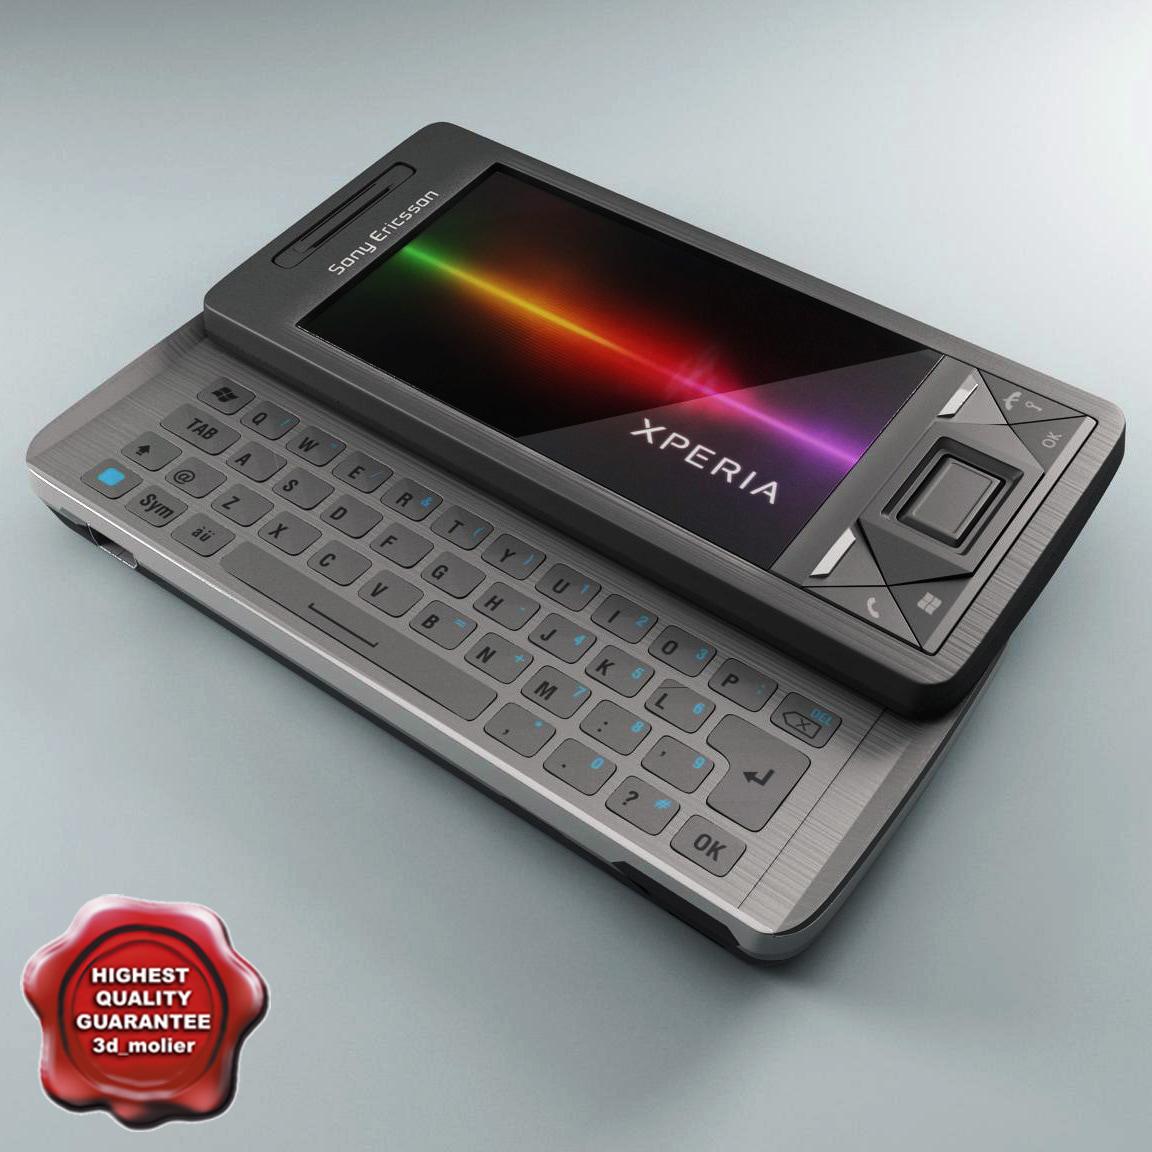 Sony_Ericsson_Xperia_X01_00.jpg